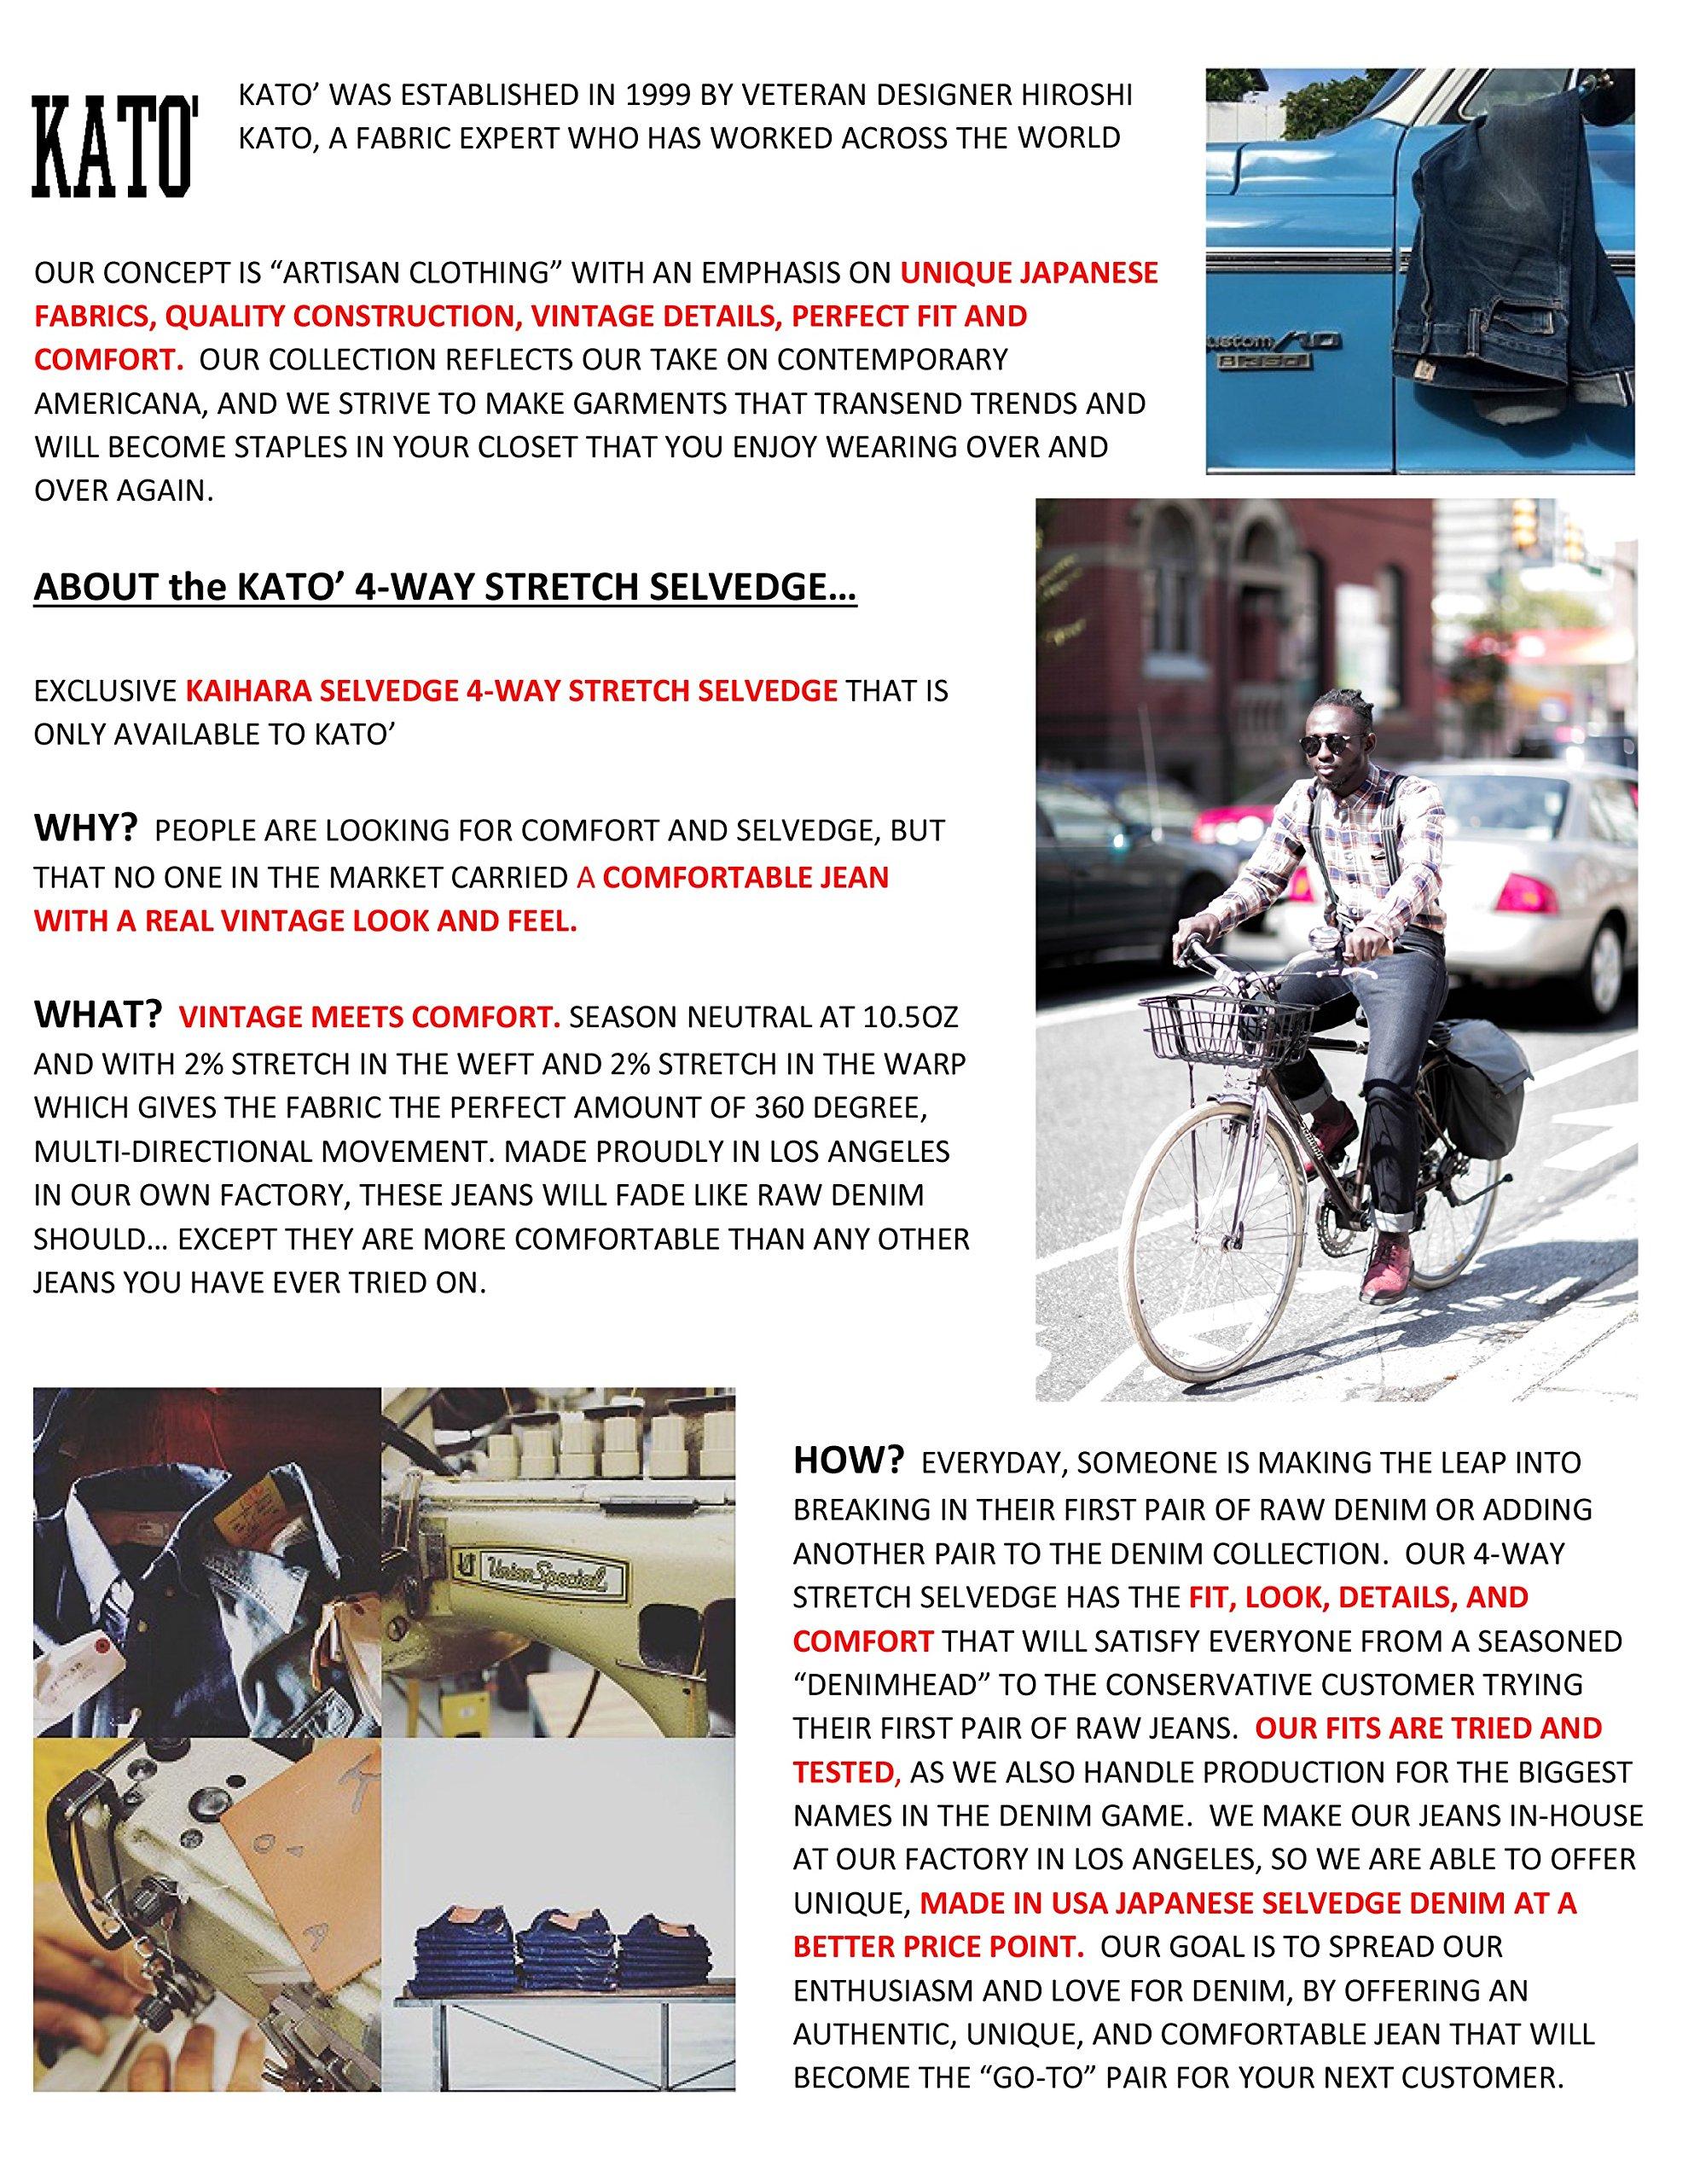 HIROSHI KATO Jeans Men's The Needle Skinny Raw Black 10.5 Oz 4-Way Stretch Selvedge Denim Skinny Fits Made In USA Raw Black 36 by HIROSHI KATO (Image #6)